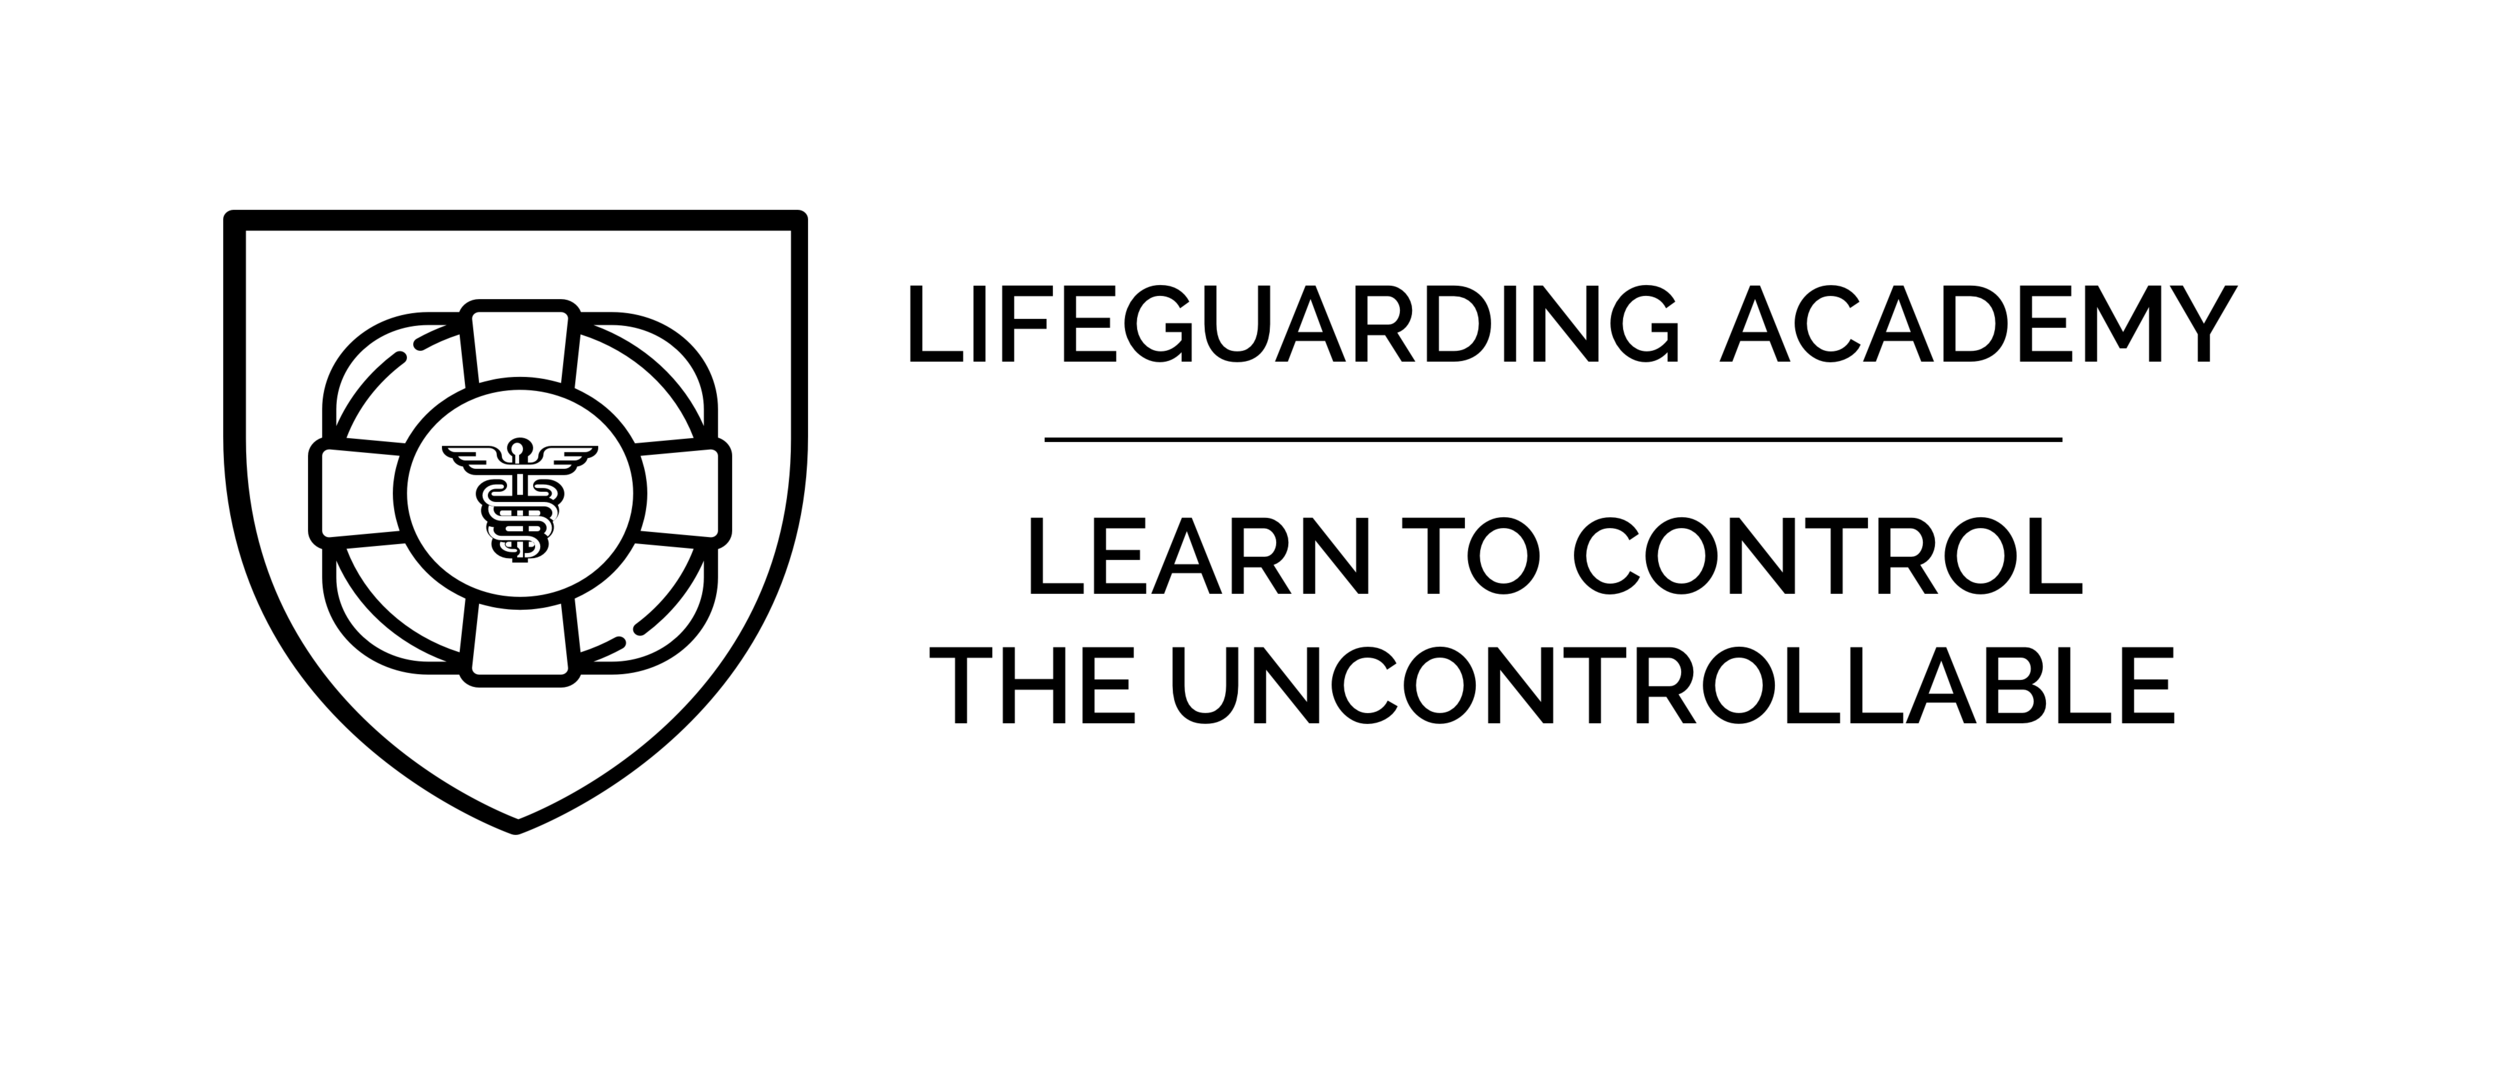 LOGO + TAGLINE BLACK.png